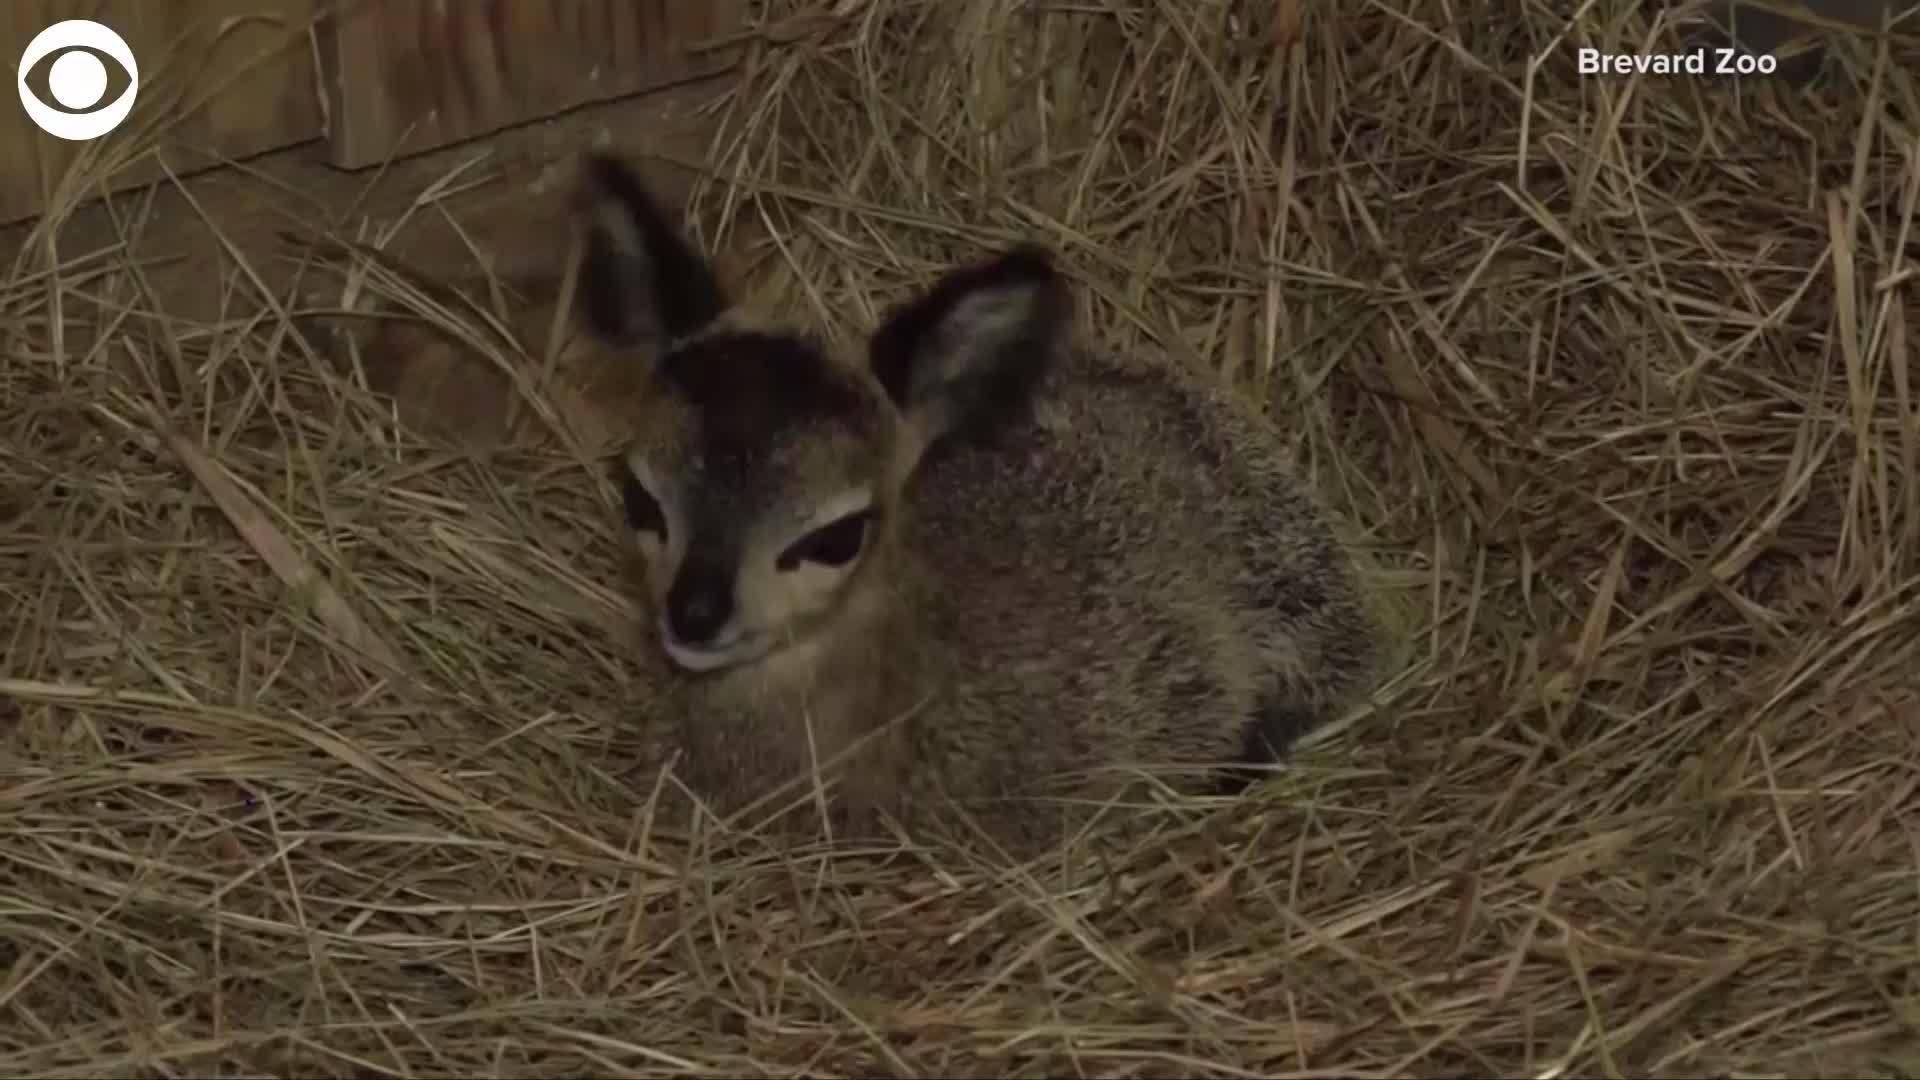 WEB EXTRA: Baby klipspringer born